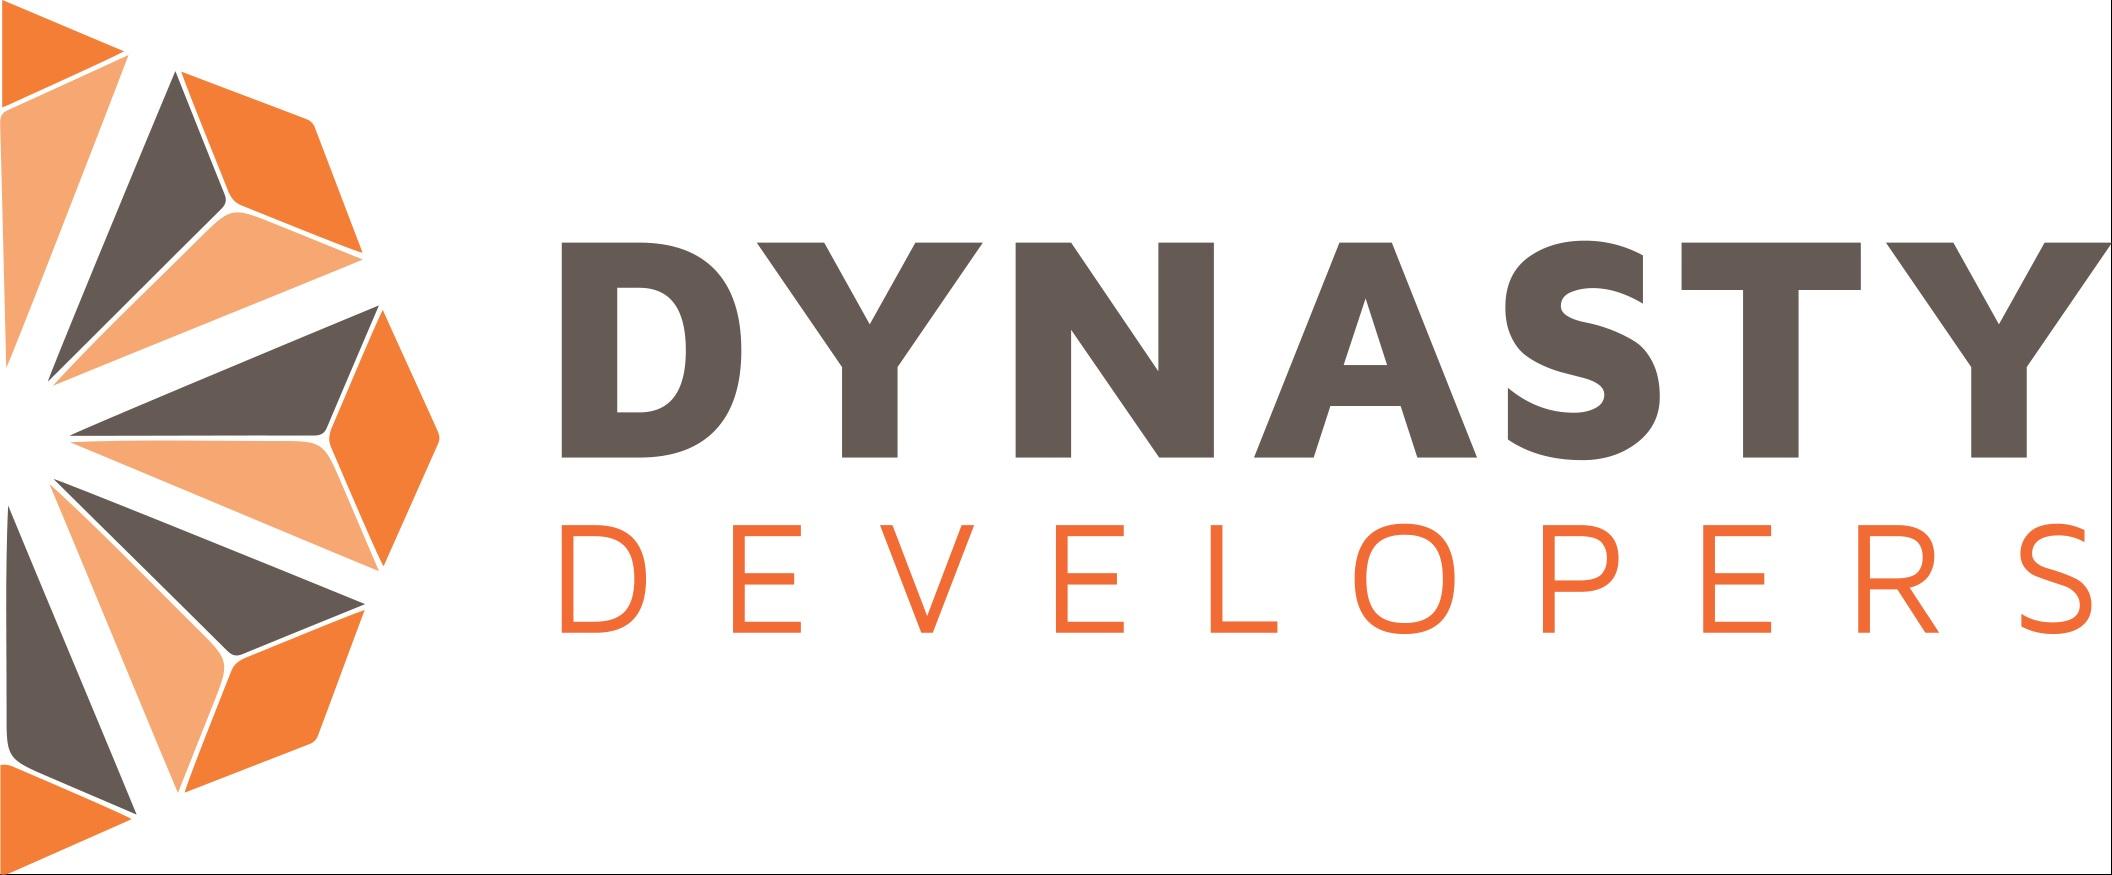 Dynasty developers